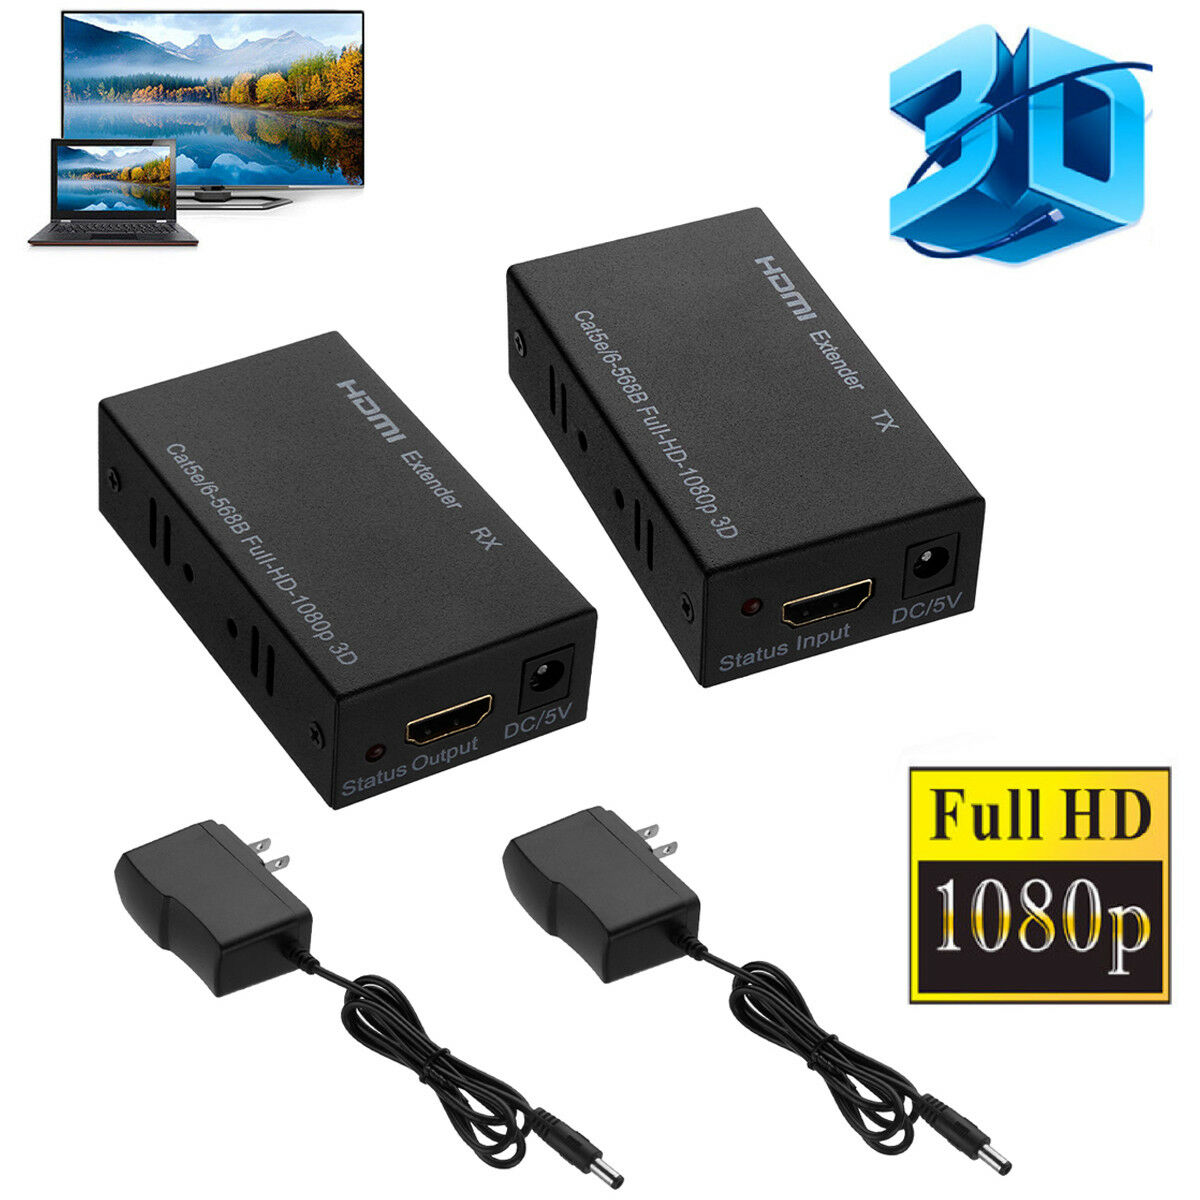 3D 1080P HDMI Network Extender Over Single Cable CAT5E/6 Ethernet RJ45 FHD 60M